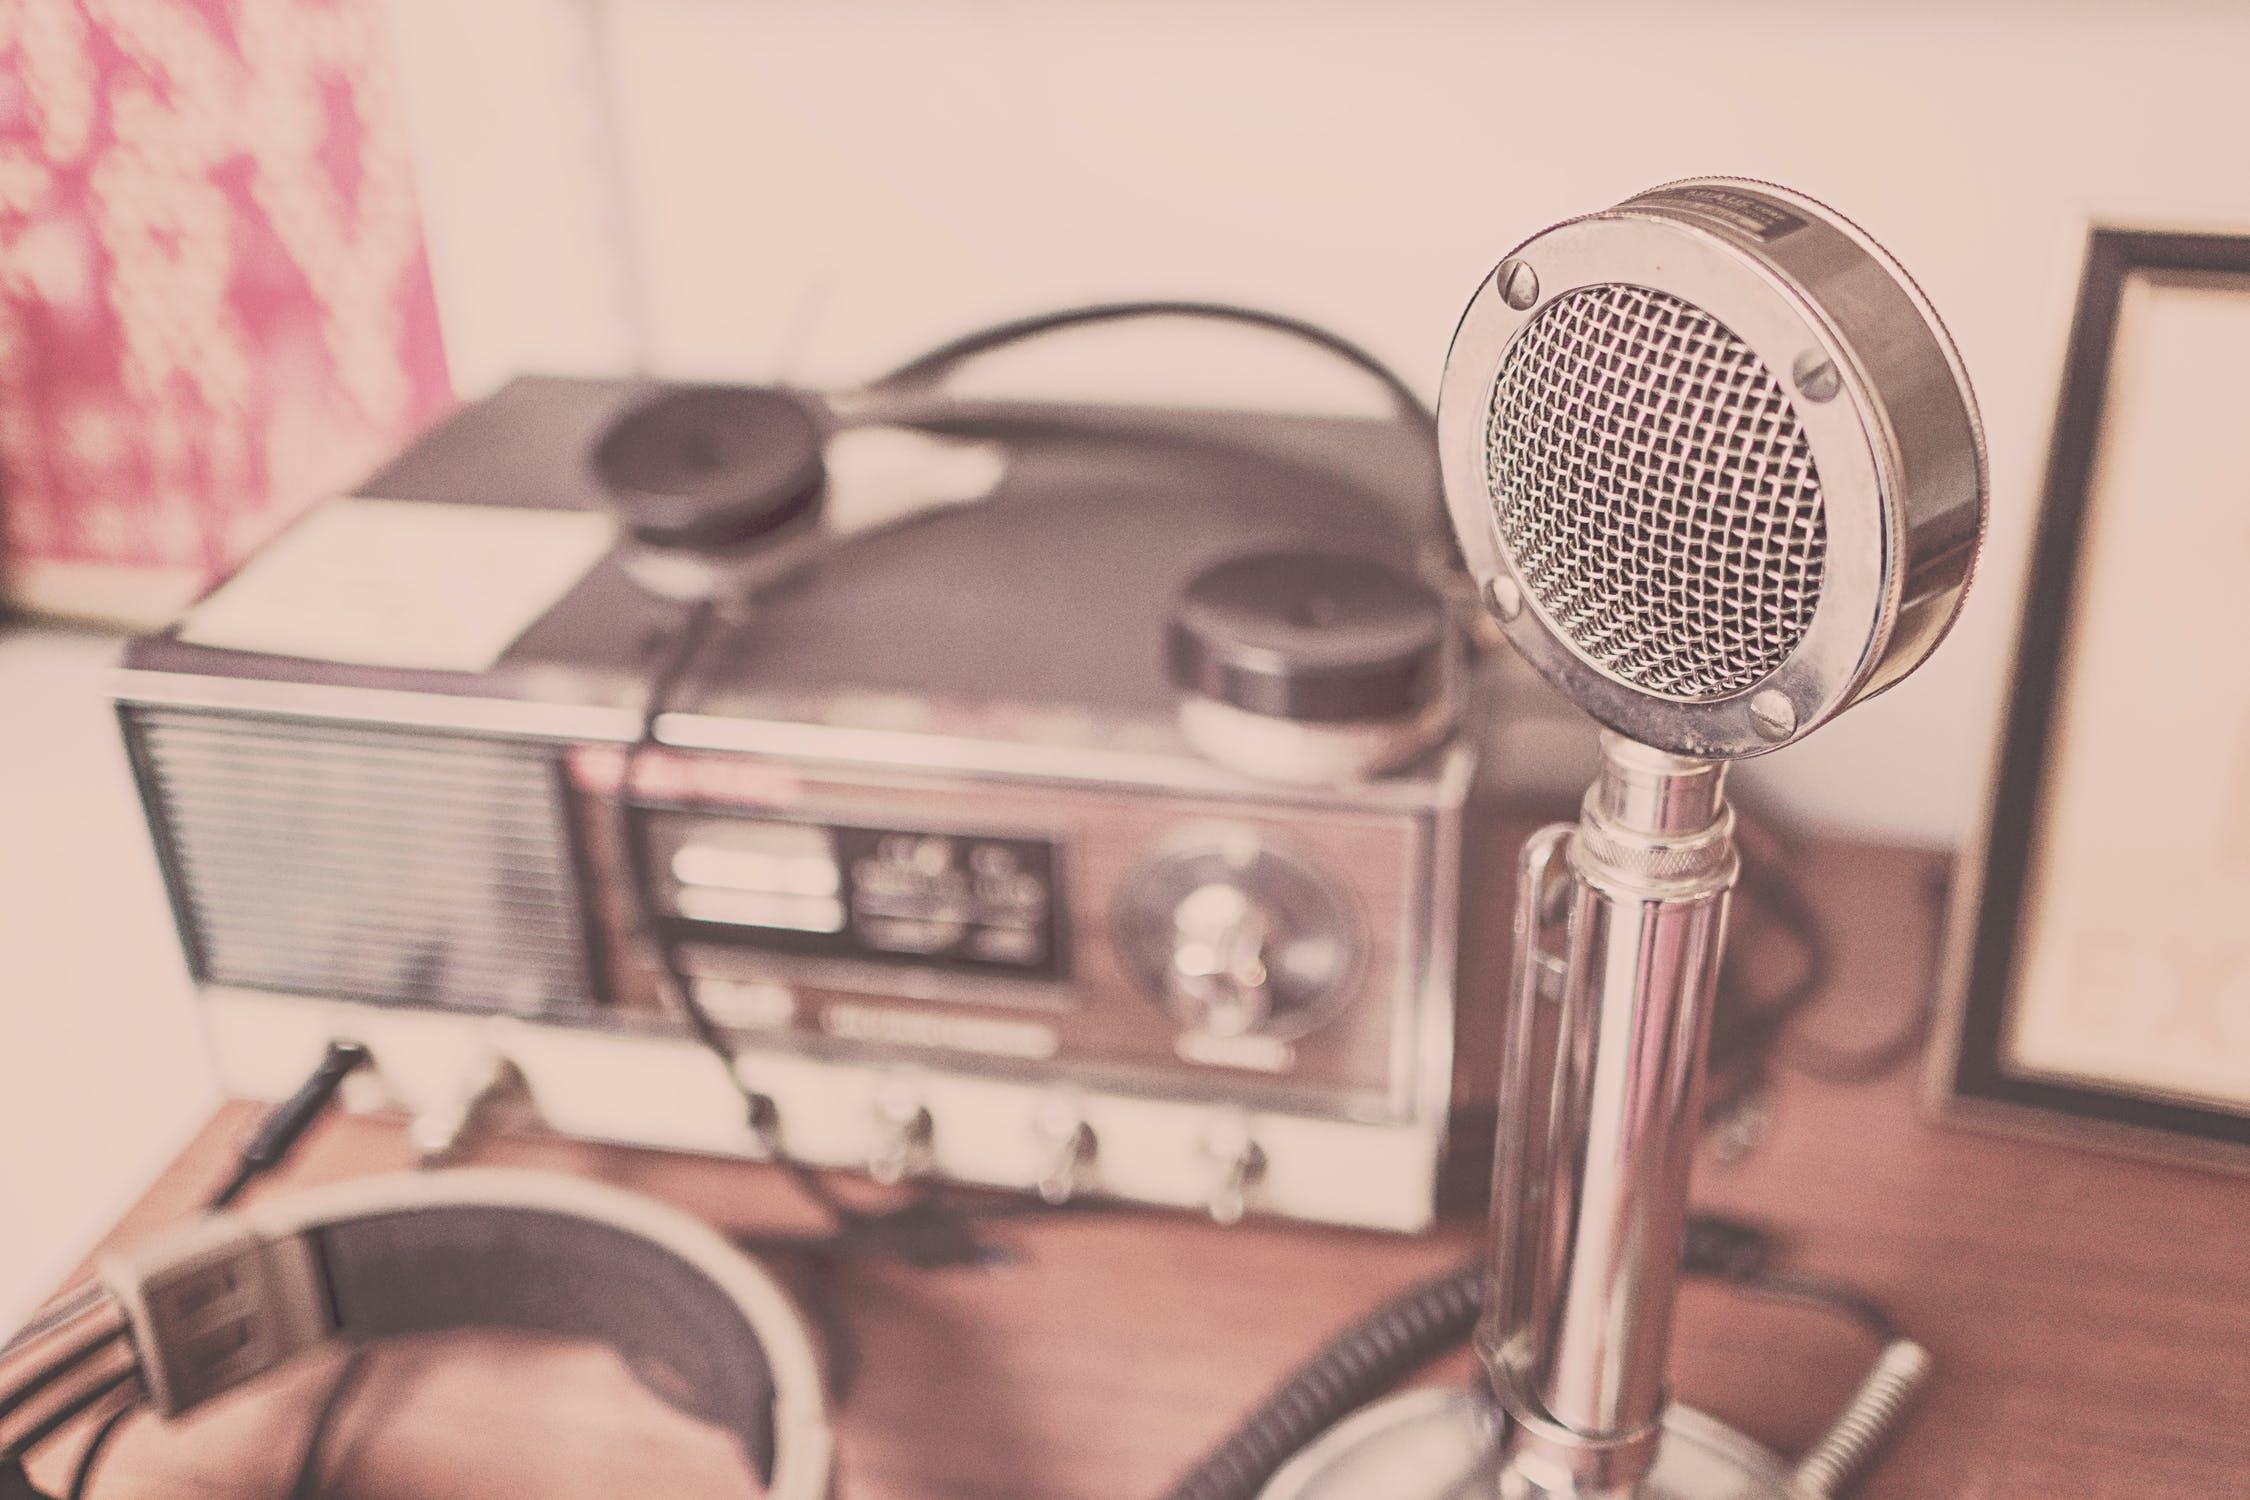 Radio Host Accused in $19.6M Texas Scam That Targeted Elderly Investors